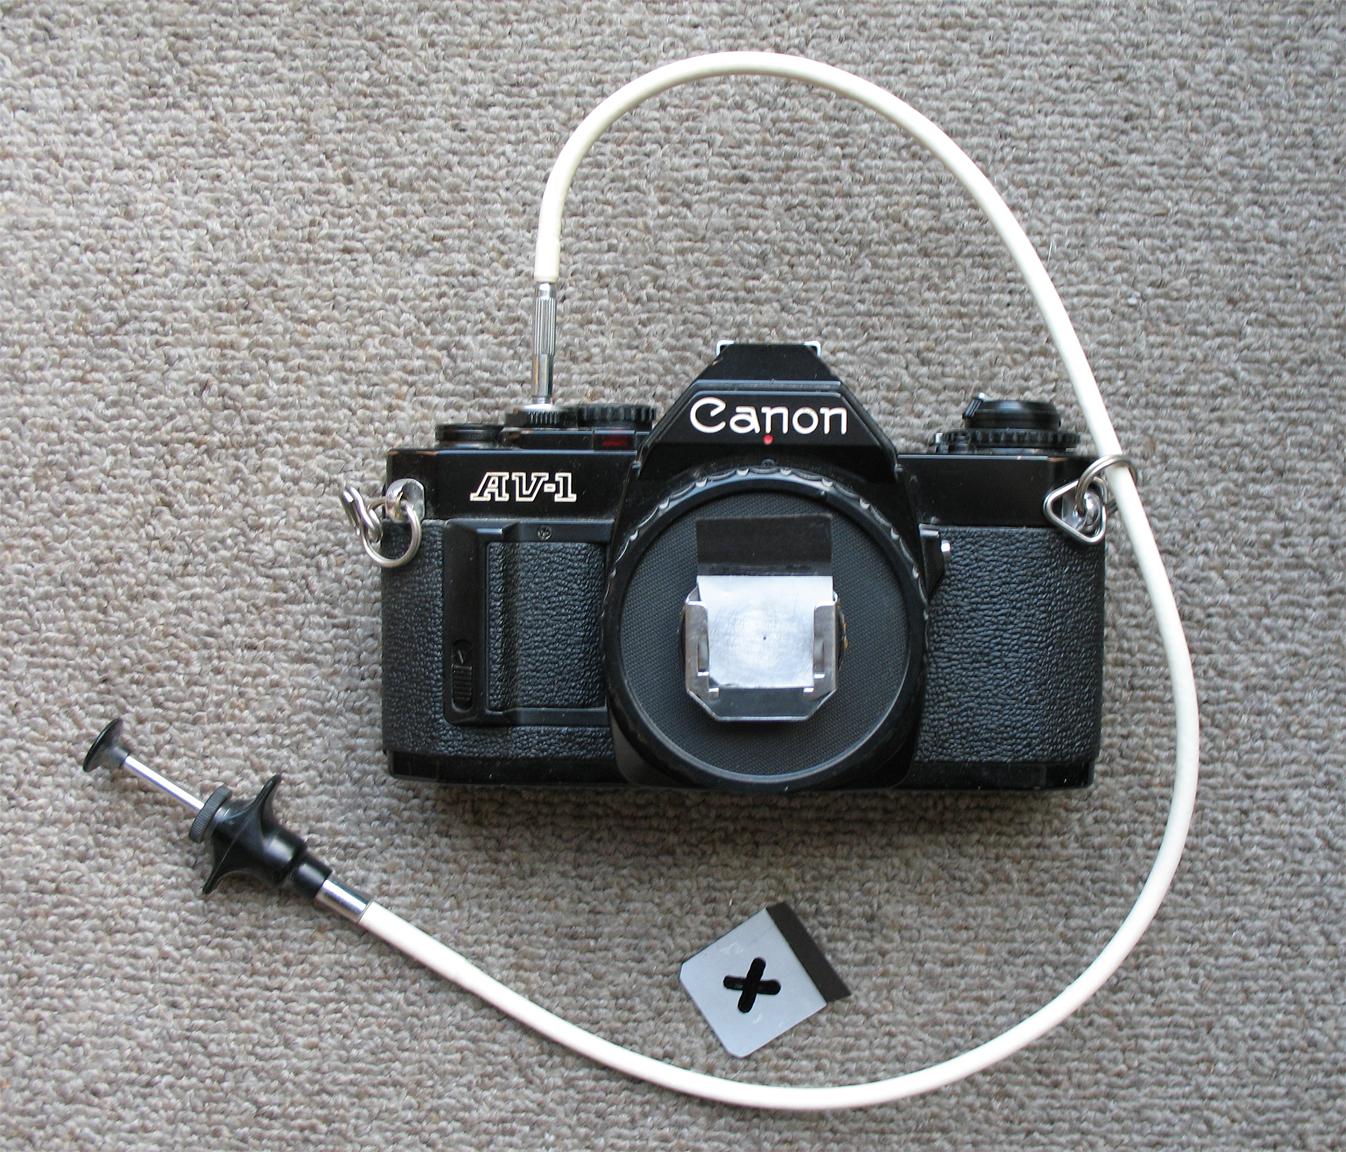 Pinhole Camera Wikipedia Byo Concert Aperture Small In Sand